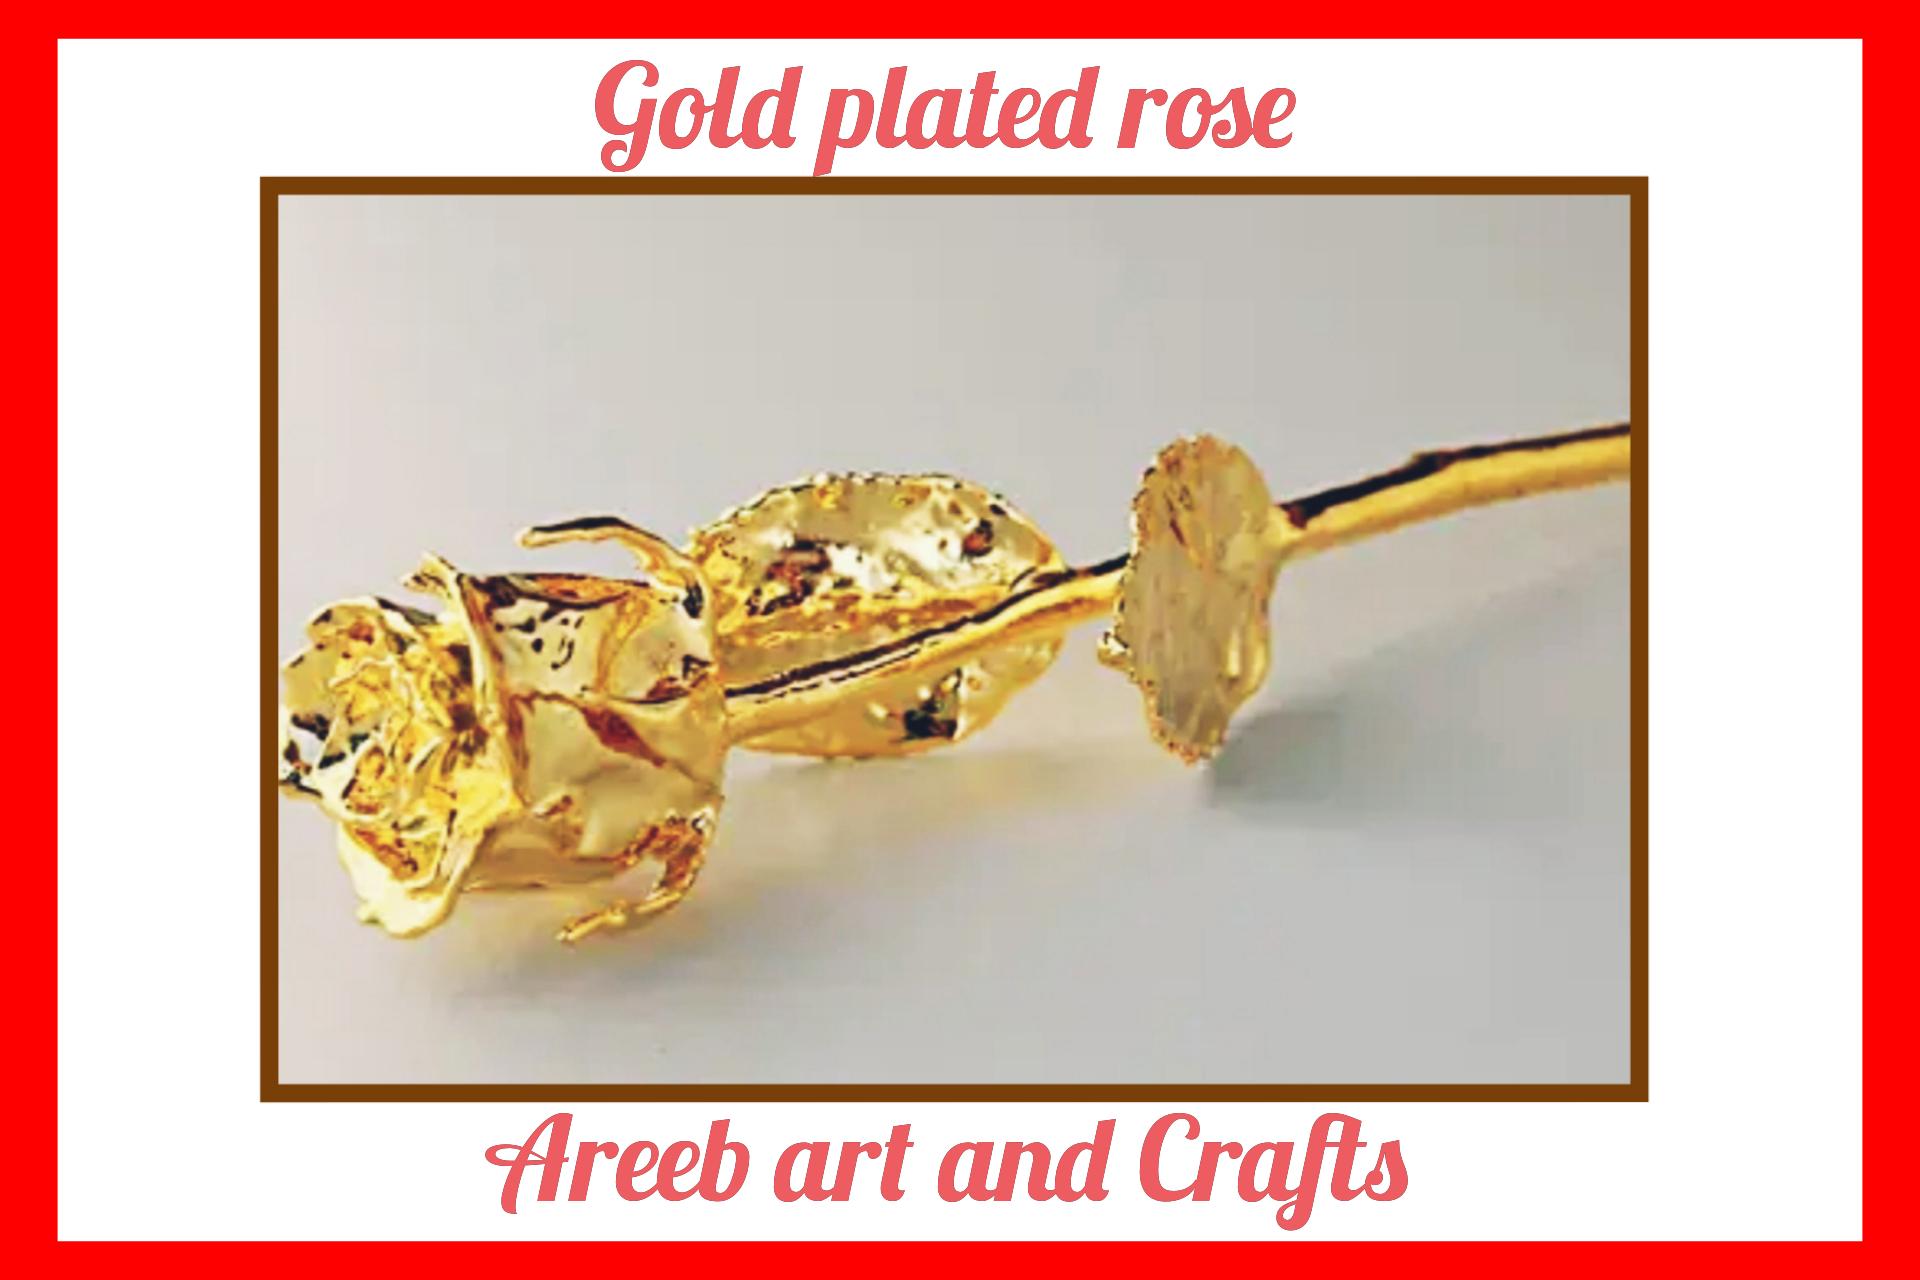 Dipped 24k gold rose